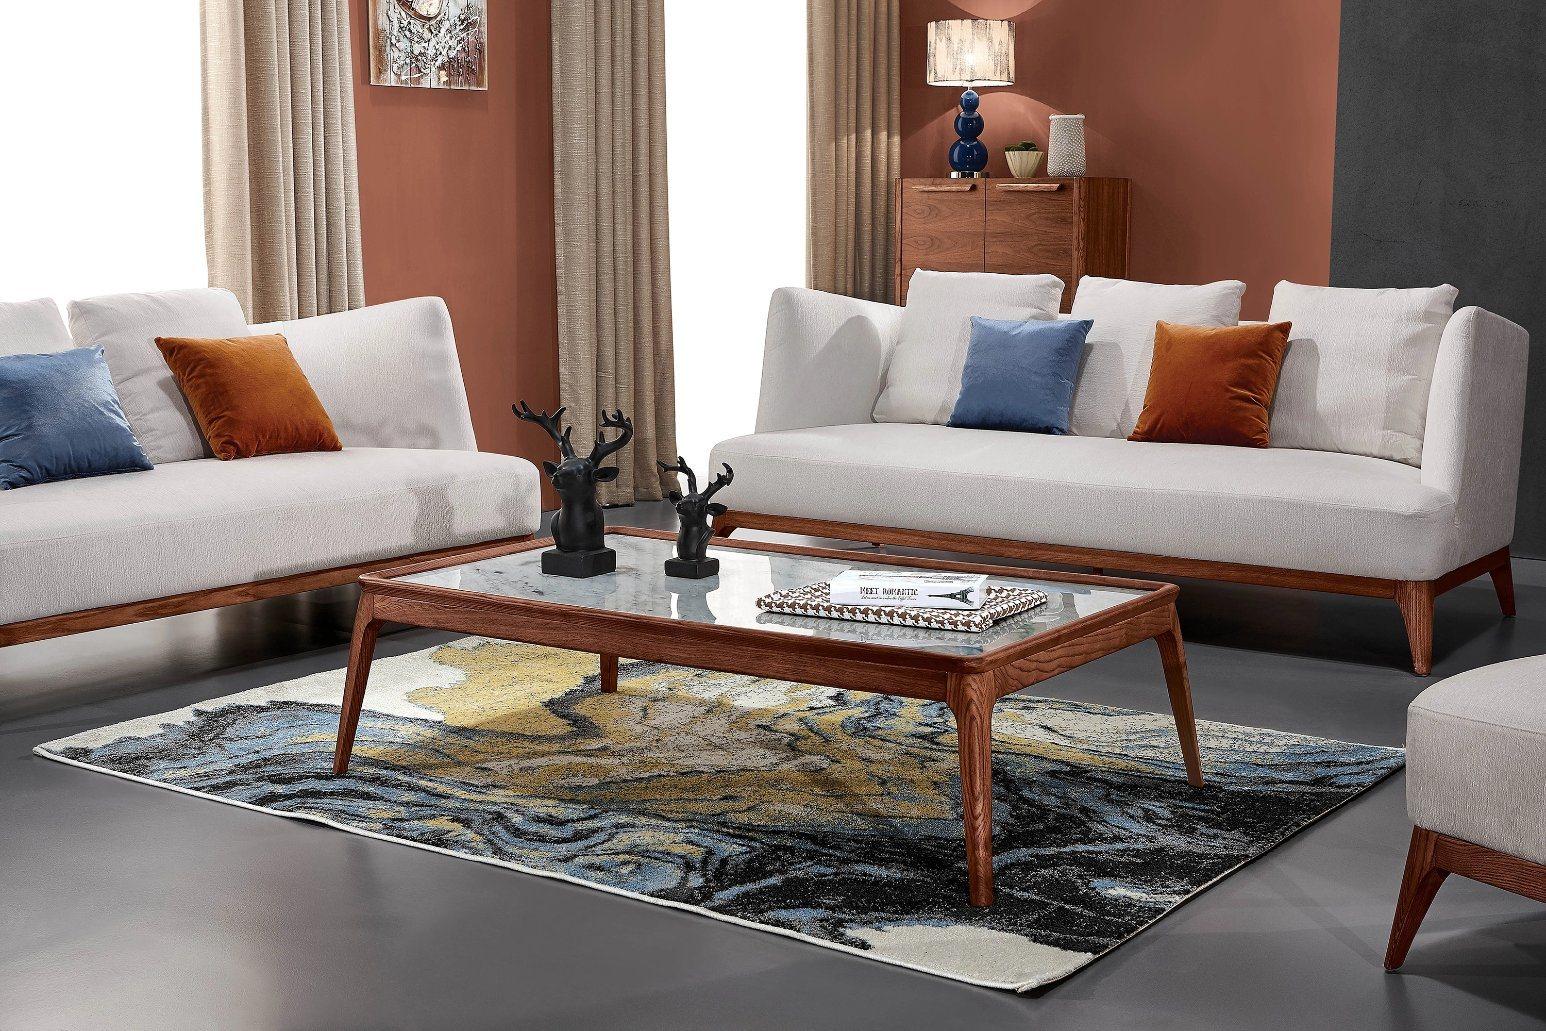 Miraculous China 1 2 3 Plus Ottoman Fabric Sofa Set Nordic Sofa Photos Pabps2019 Chair Design Images Pabps2019Com